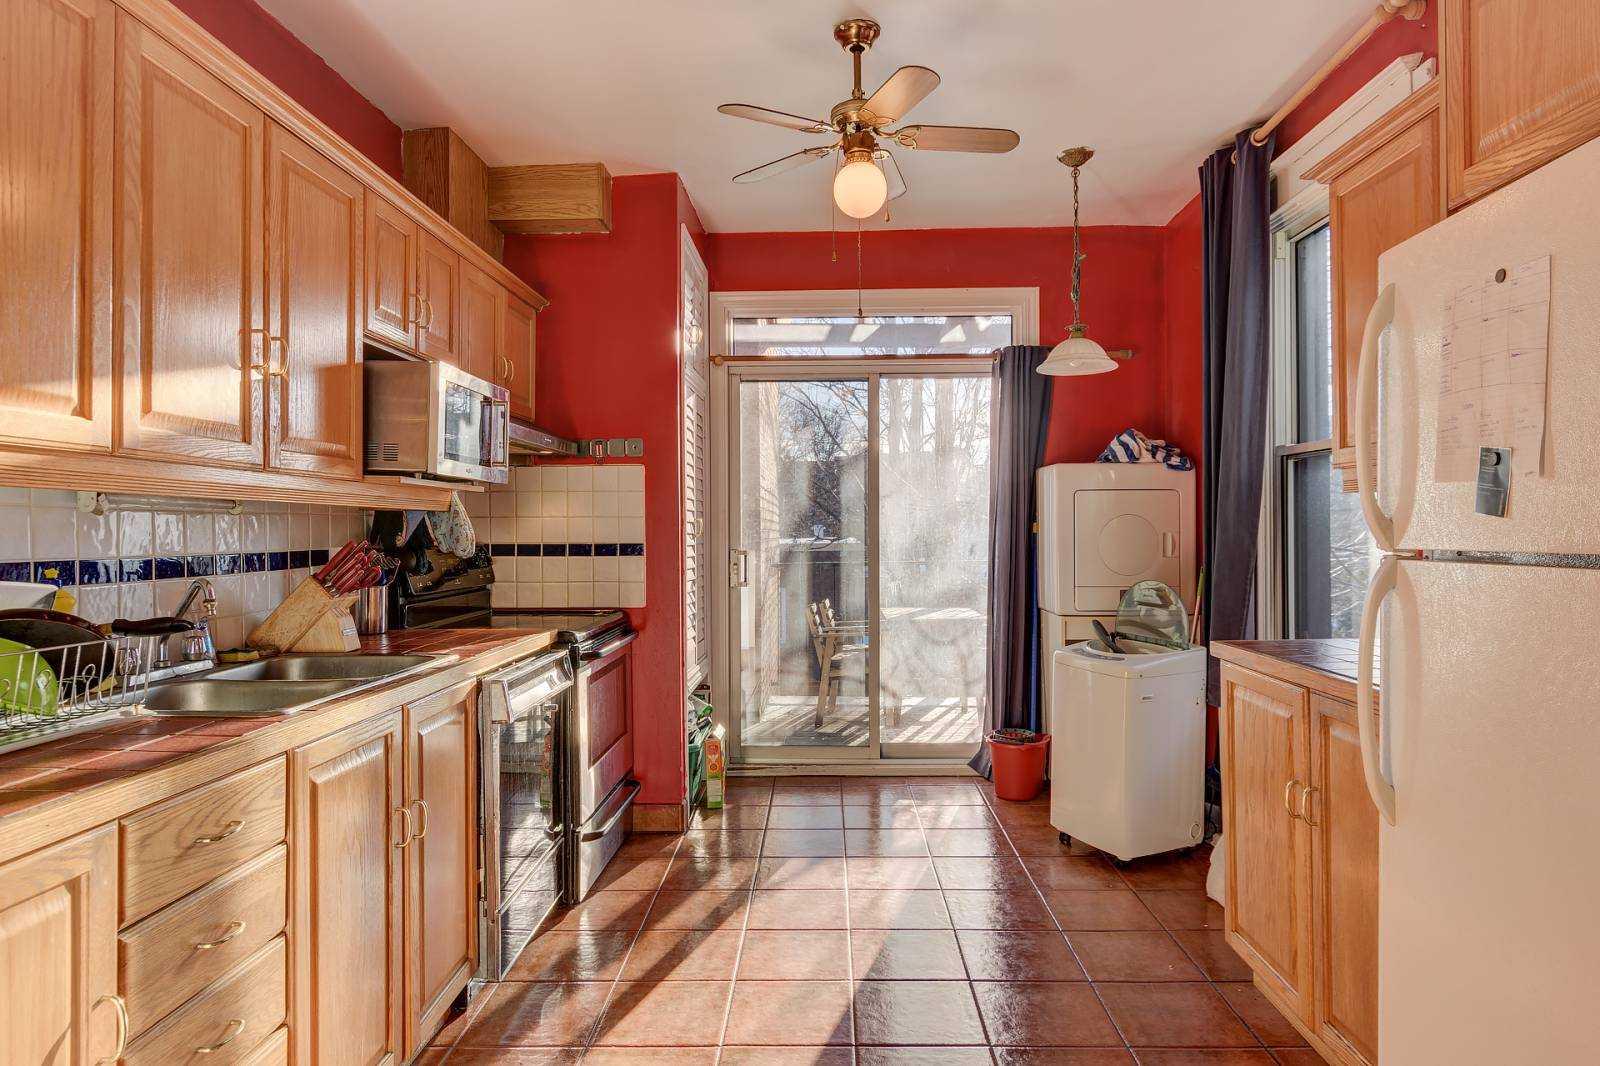 rooms-to-rent-mtl-kitchen-3